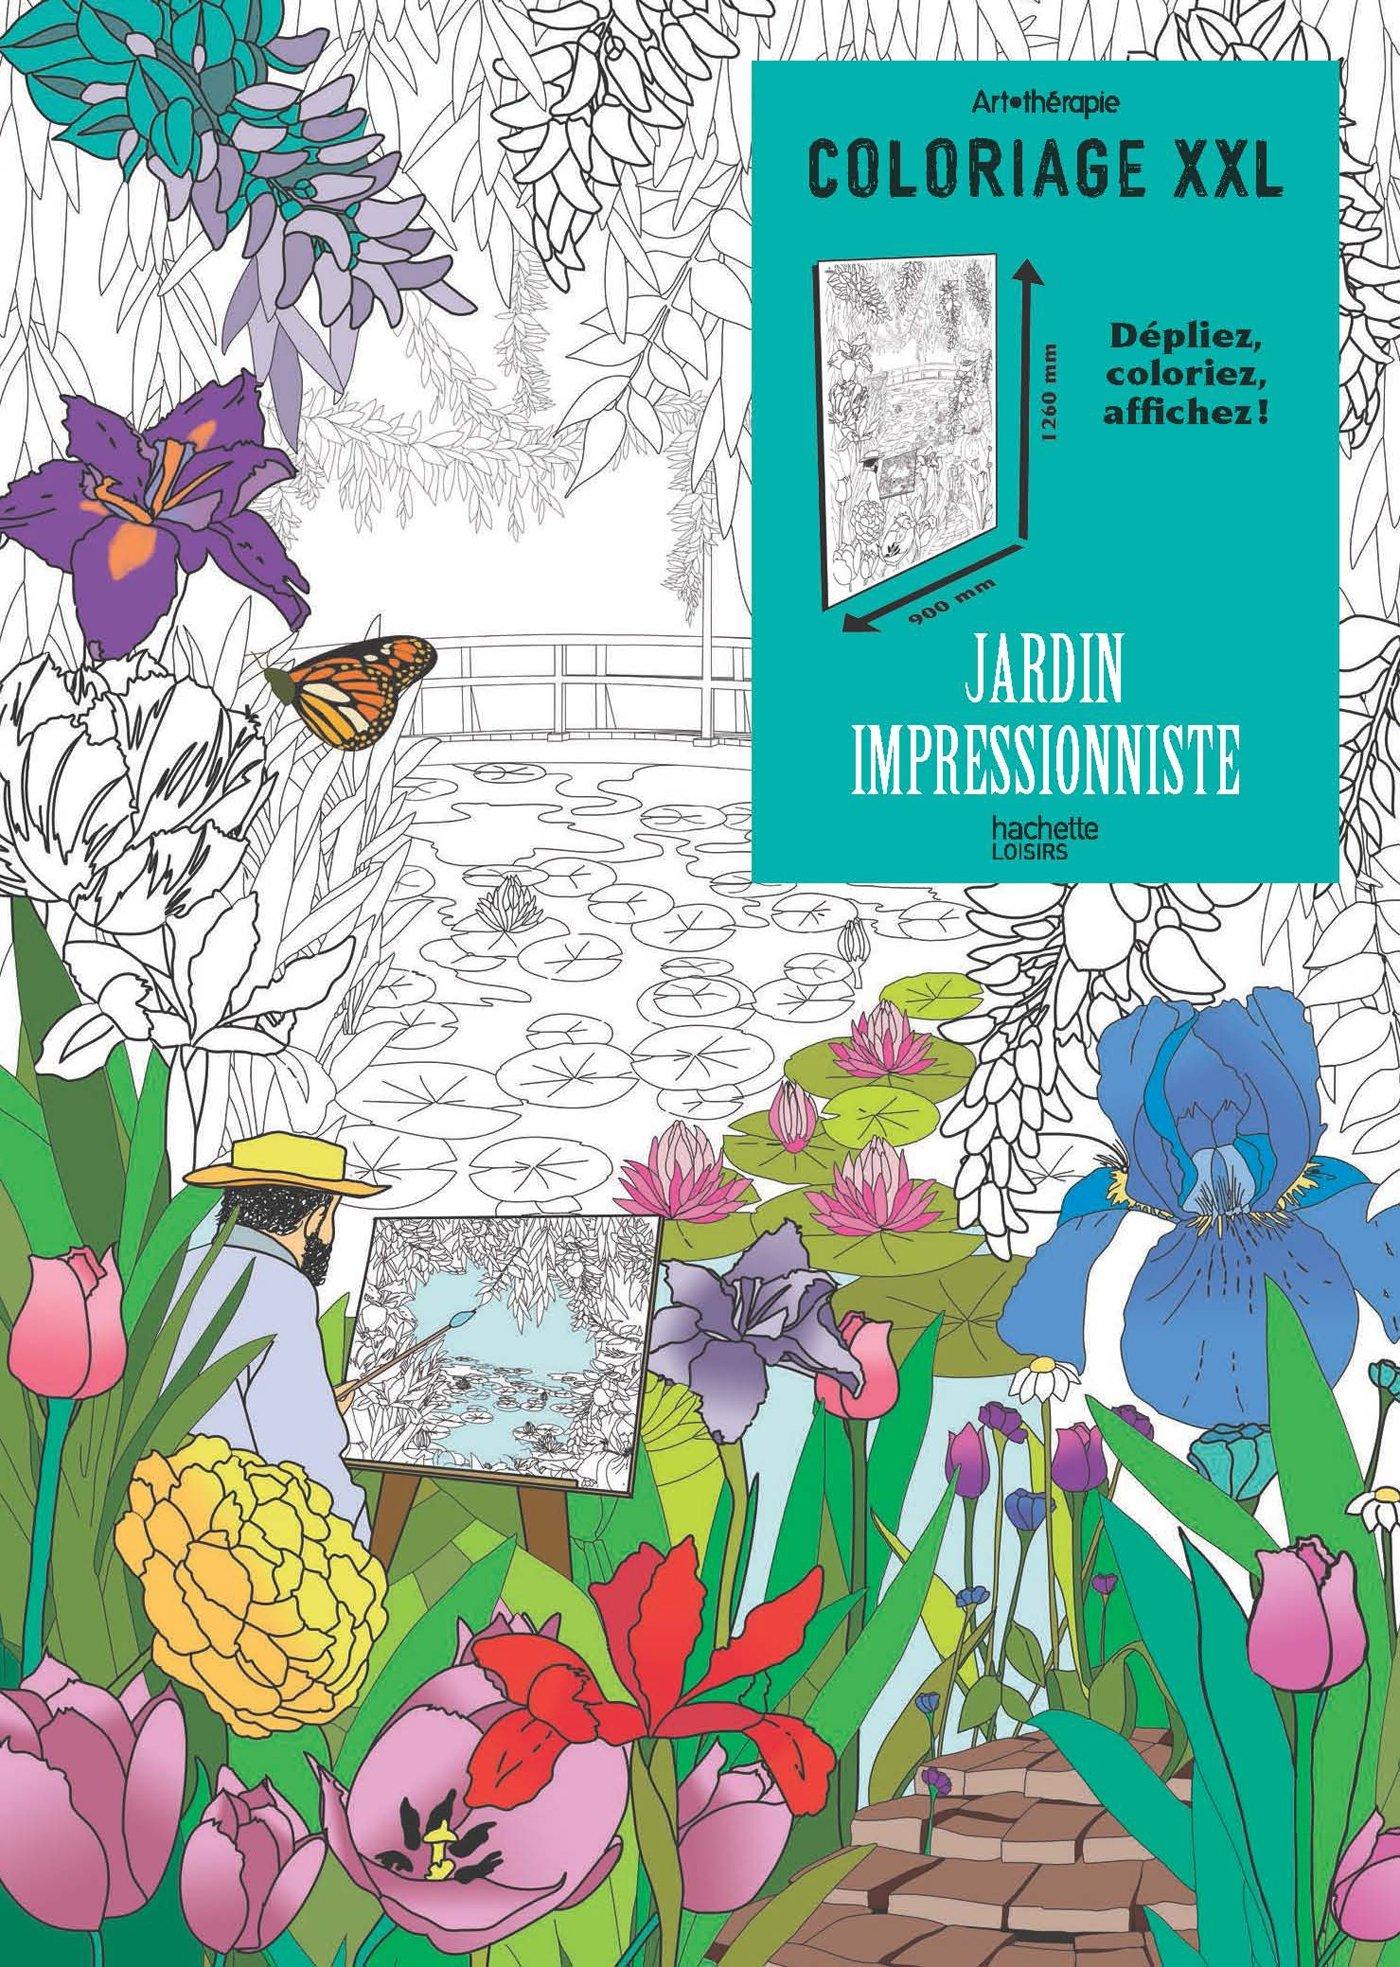 Coloriage Xxl Jardin Impressionniste Amazon Fr Terrazzoni Julie Livres